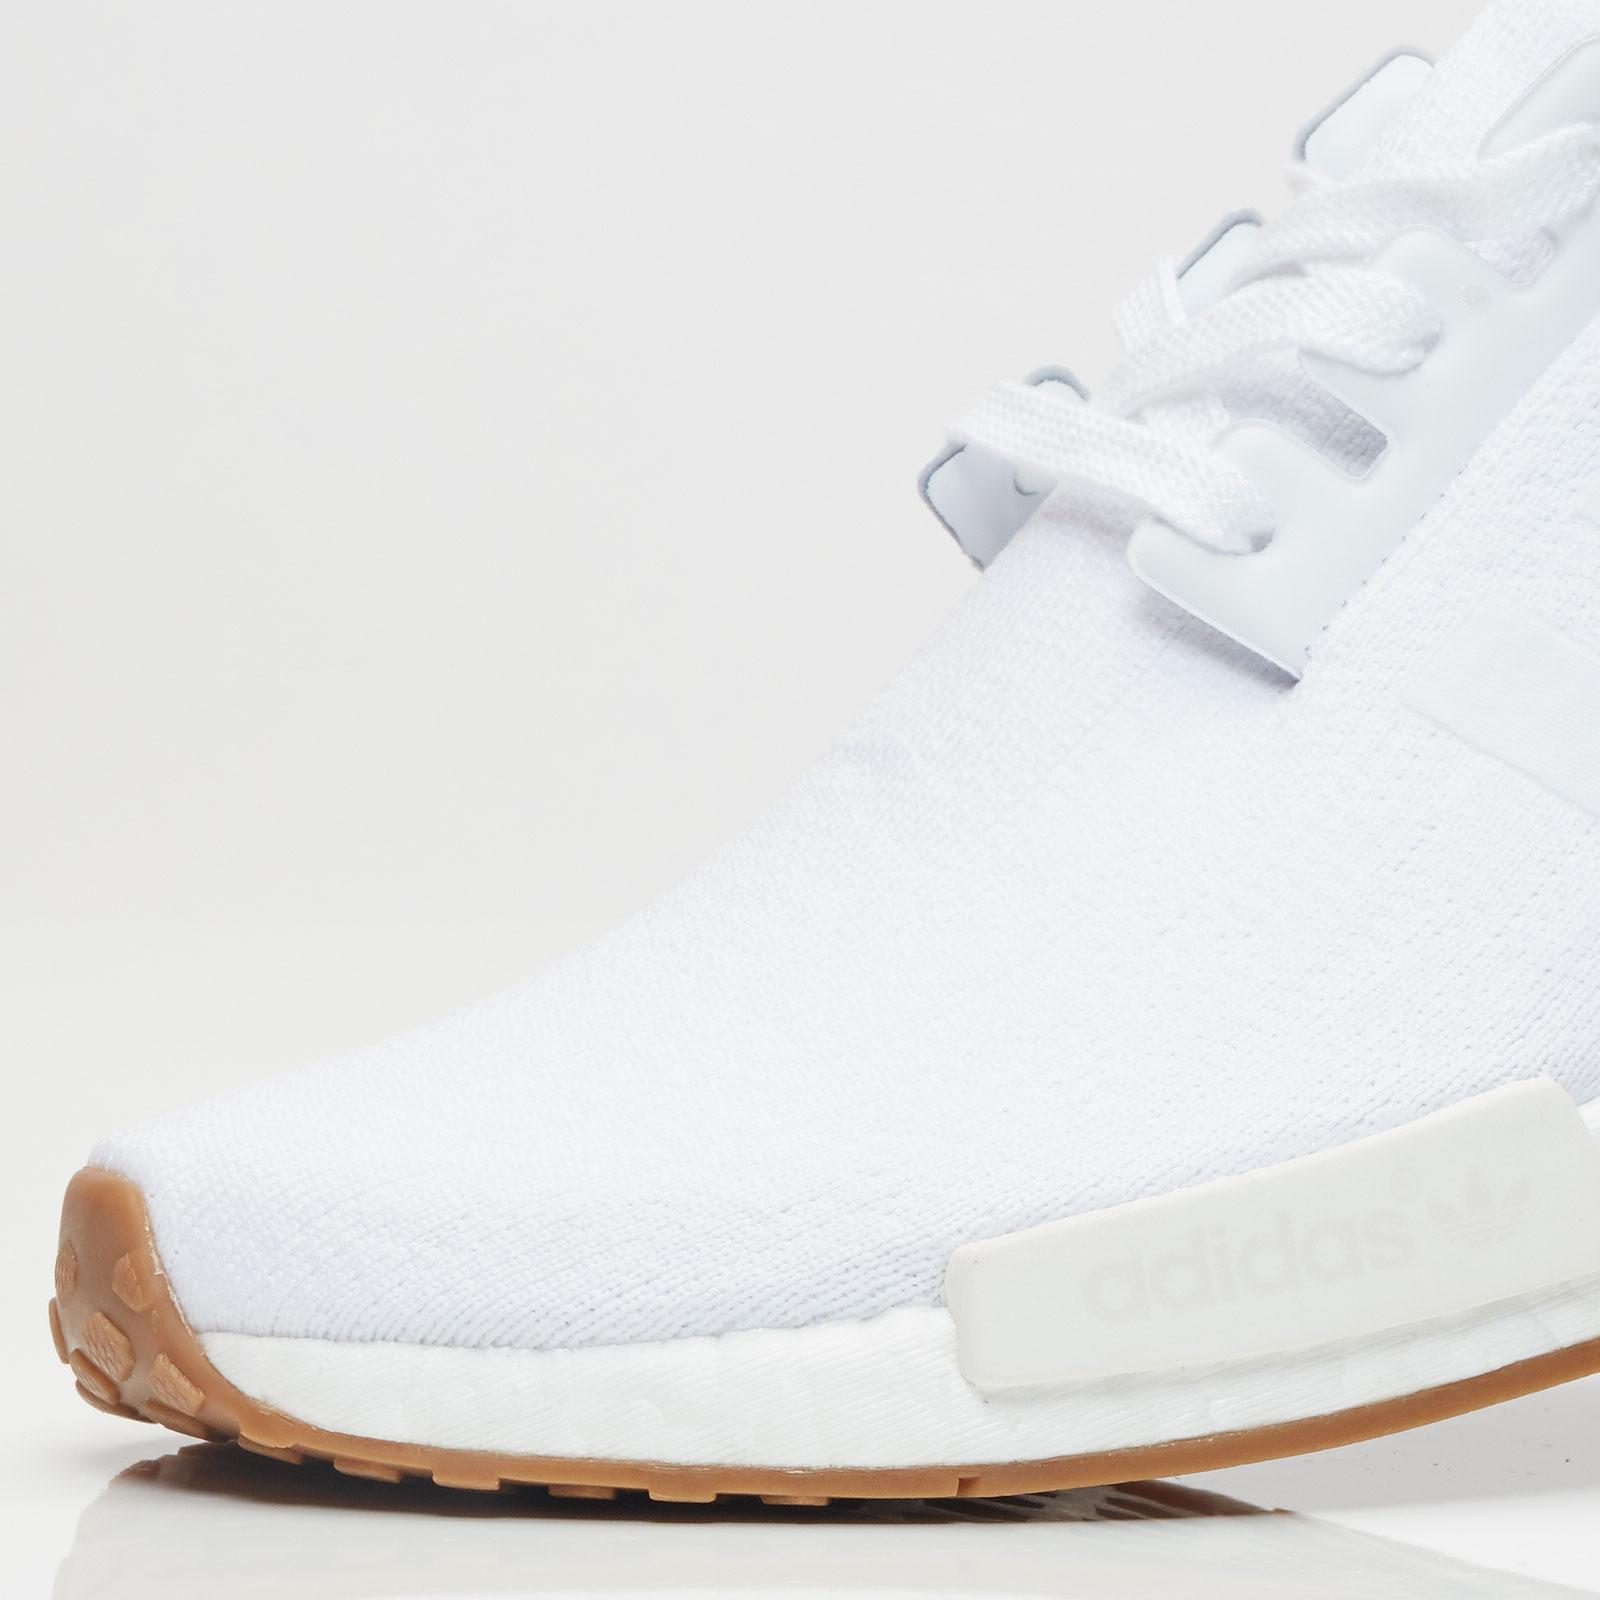 adidas nmd r1 pk by1888 sneakersnstuff scarpe & streetwear